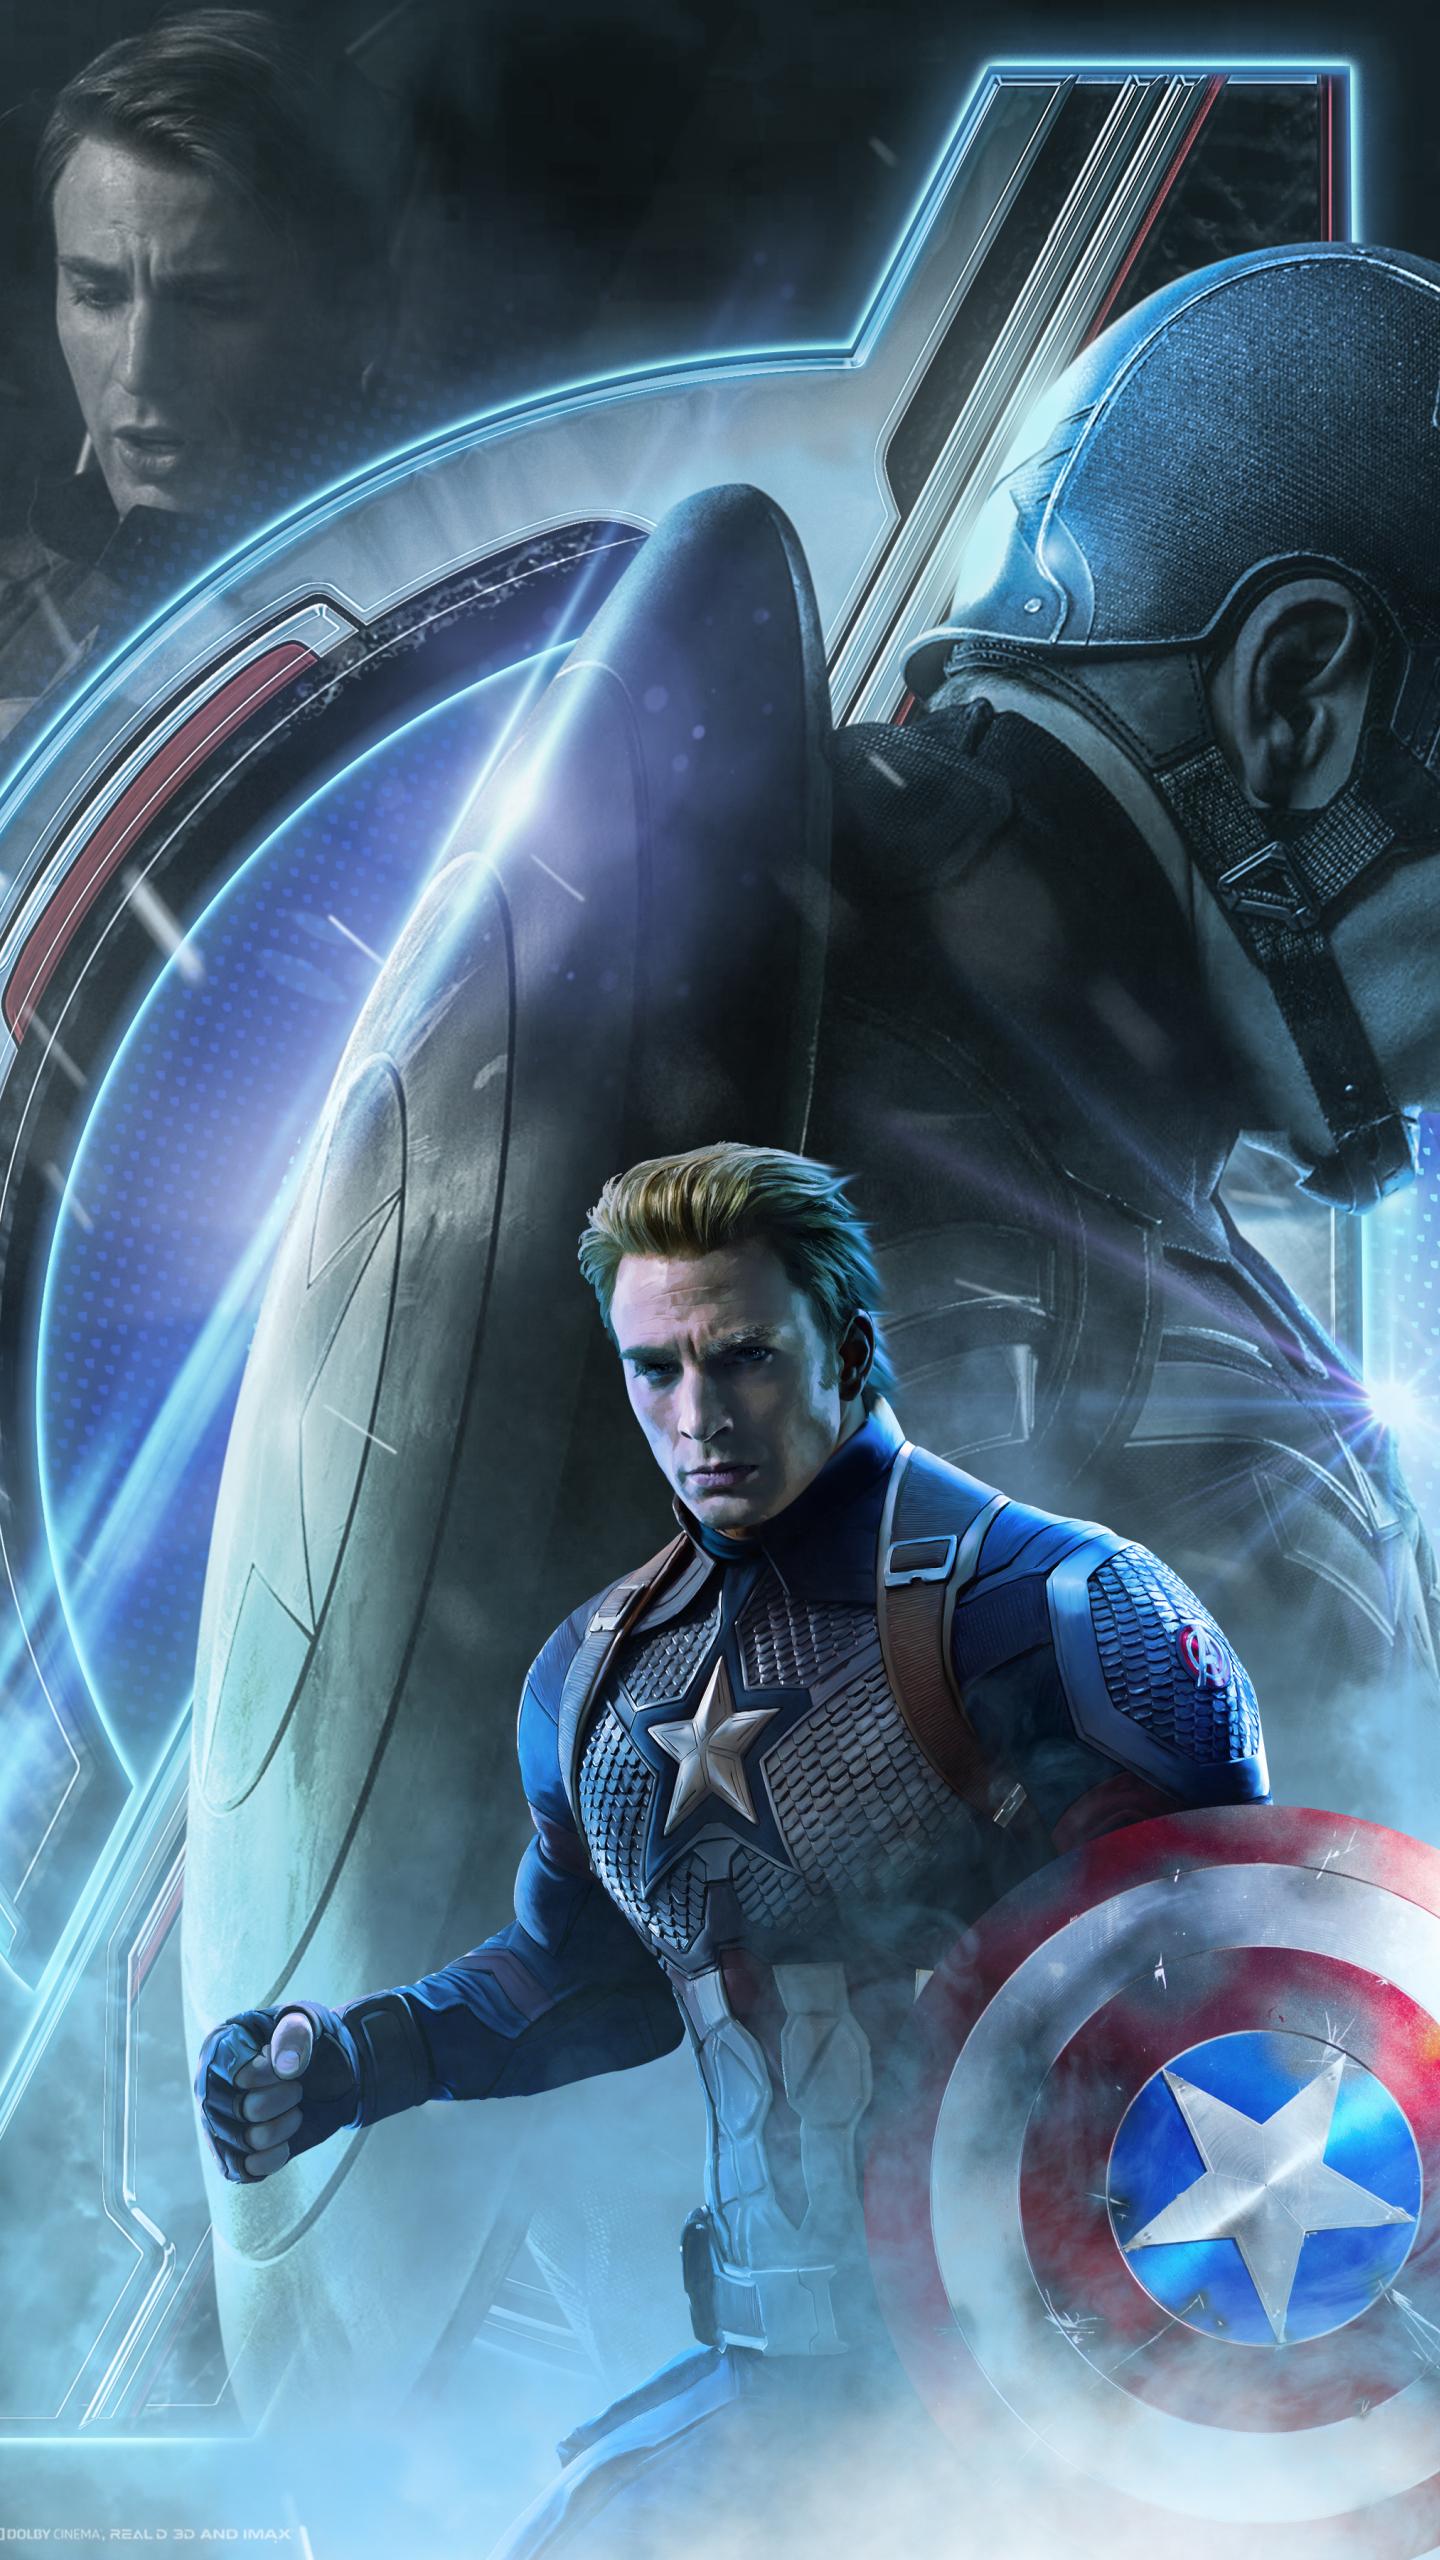 avengers captain endgame america poster wallpapers phone background samsung resolution end marvel movies sony hdqwalls google evans chris 4k pixel